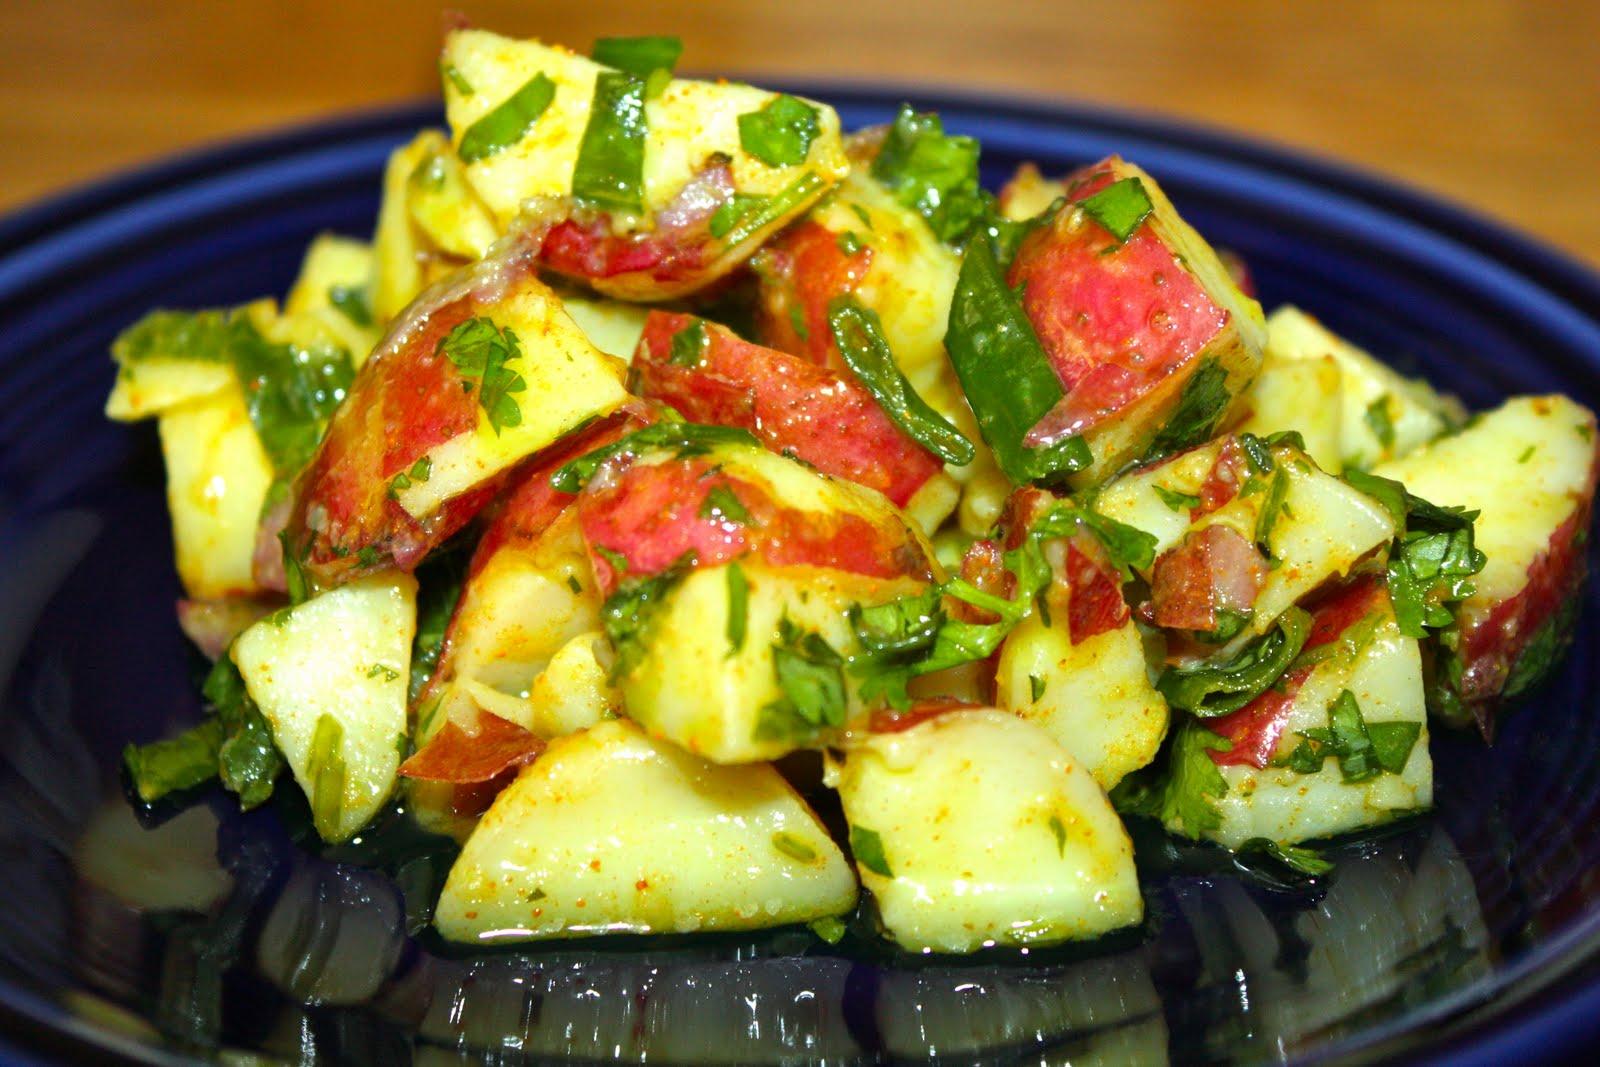 18 Hour Kitchen: Curried Potato Salad (vegan)